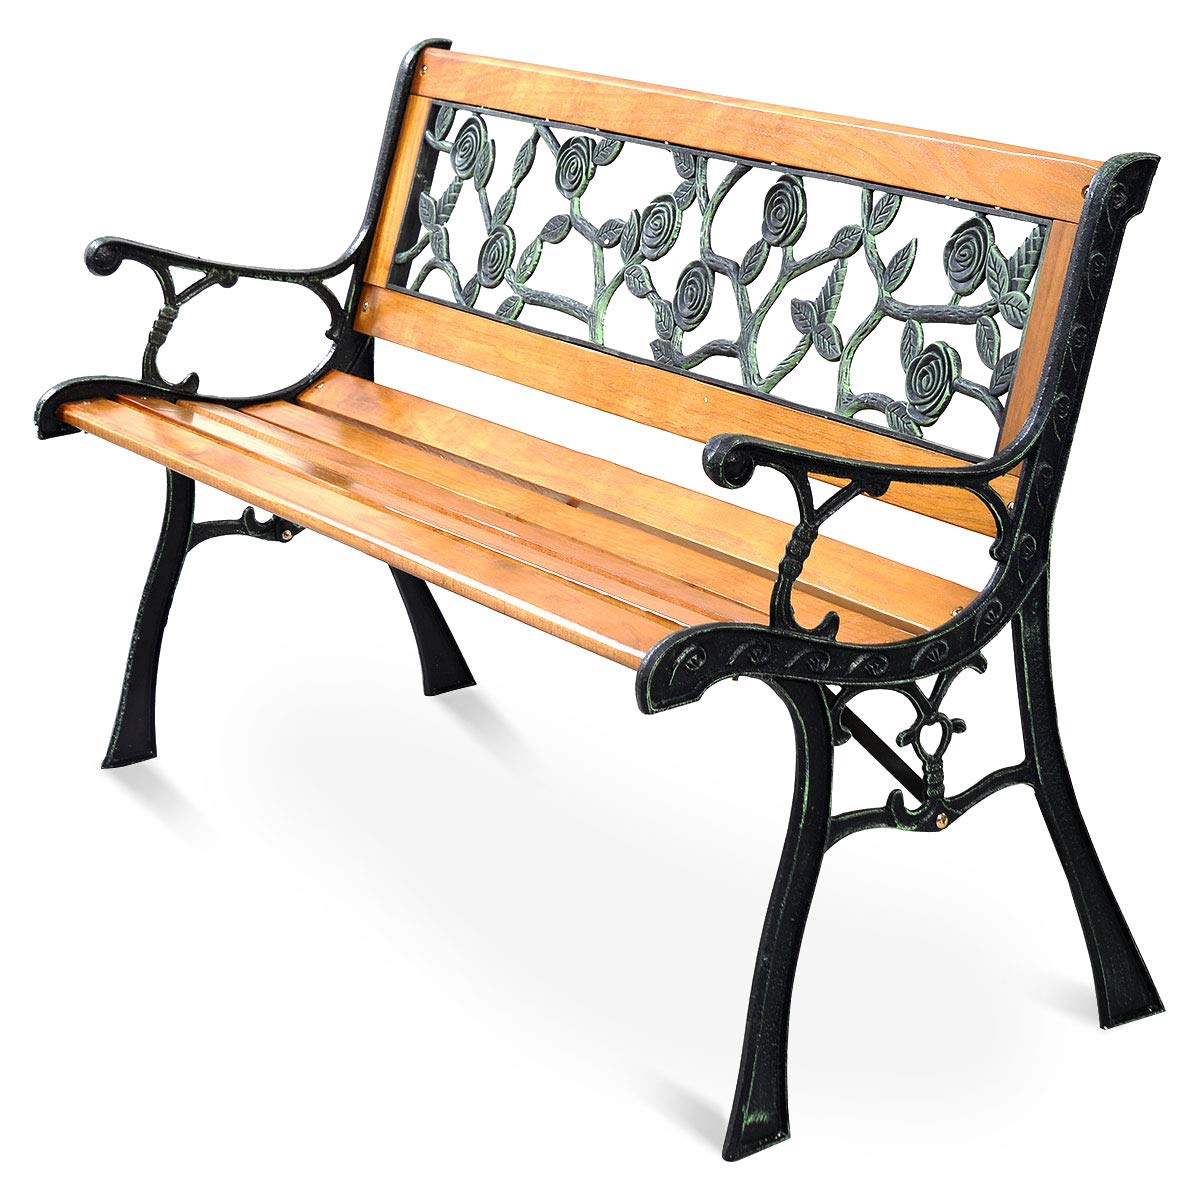 Giantex 50'' Patio Park Garden Bench, Outdoor Furniture Rose Cast Iron Hardwood Frame Porch Loveseat for 2 Person Outdoor